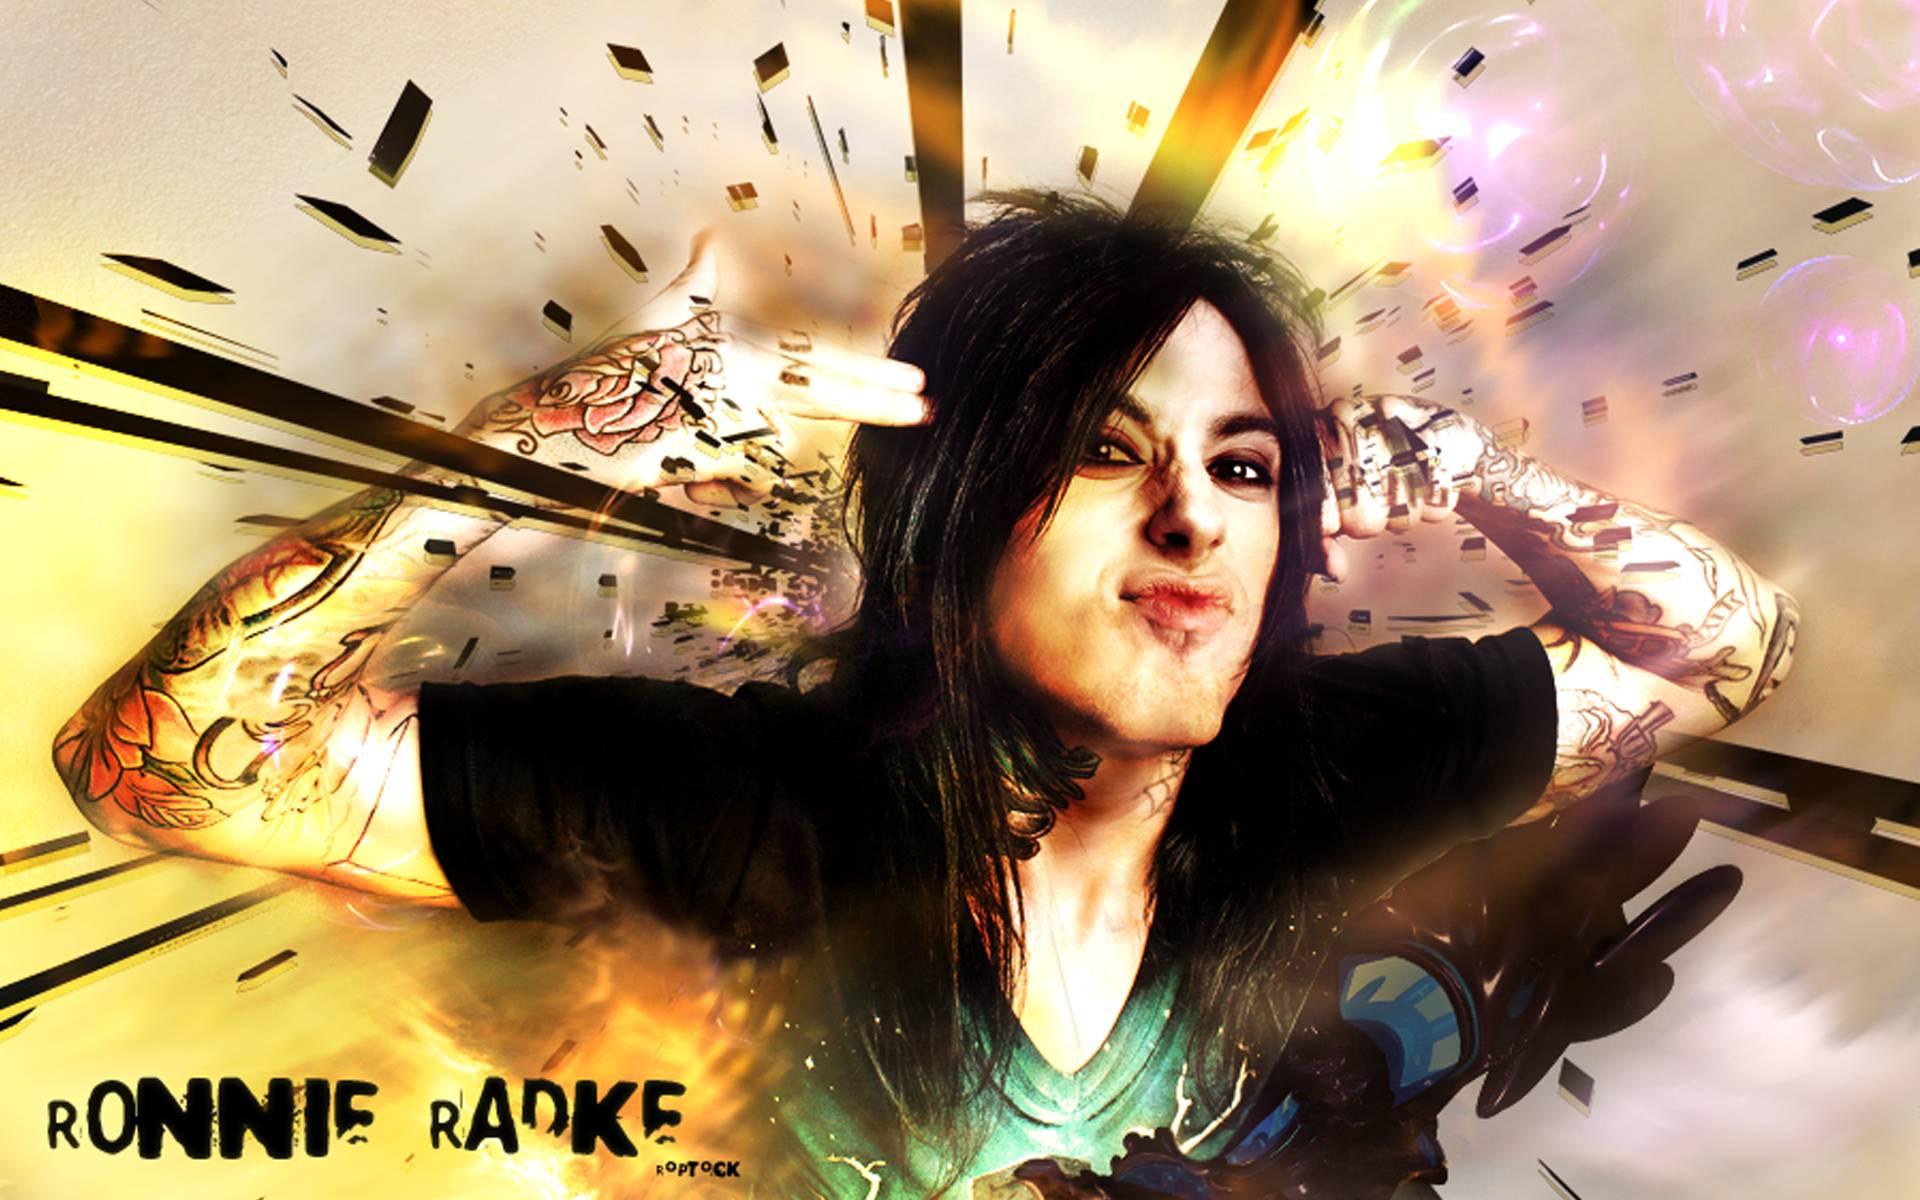 Ronnie radke wallpaper